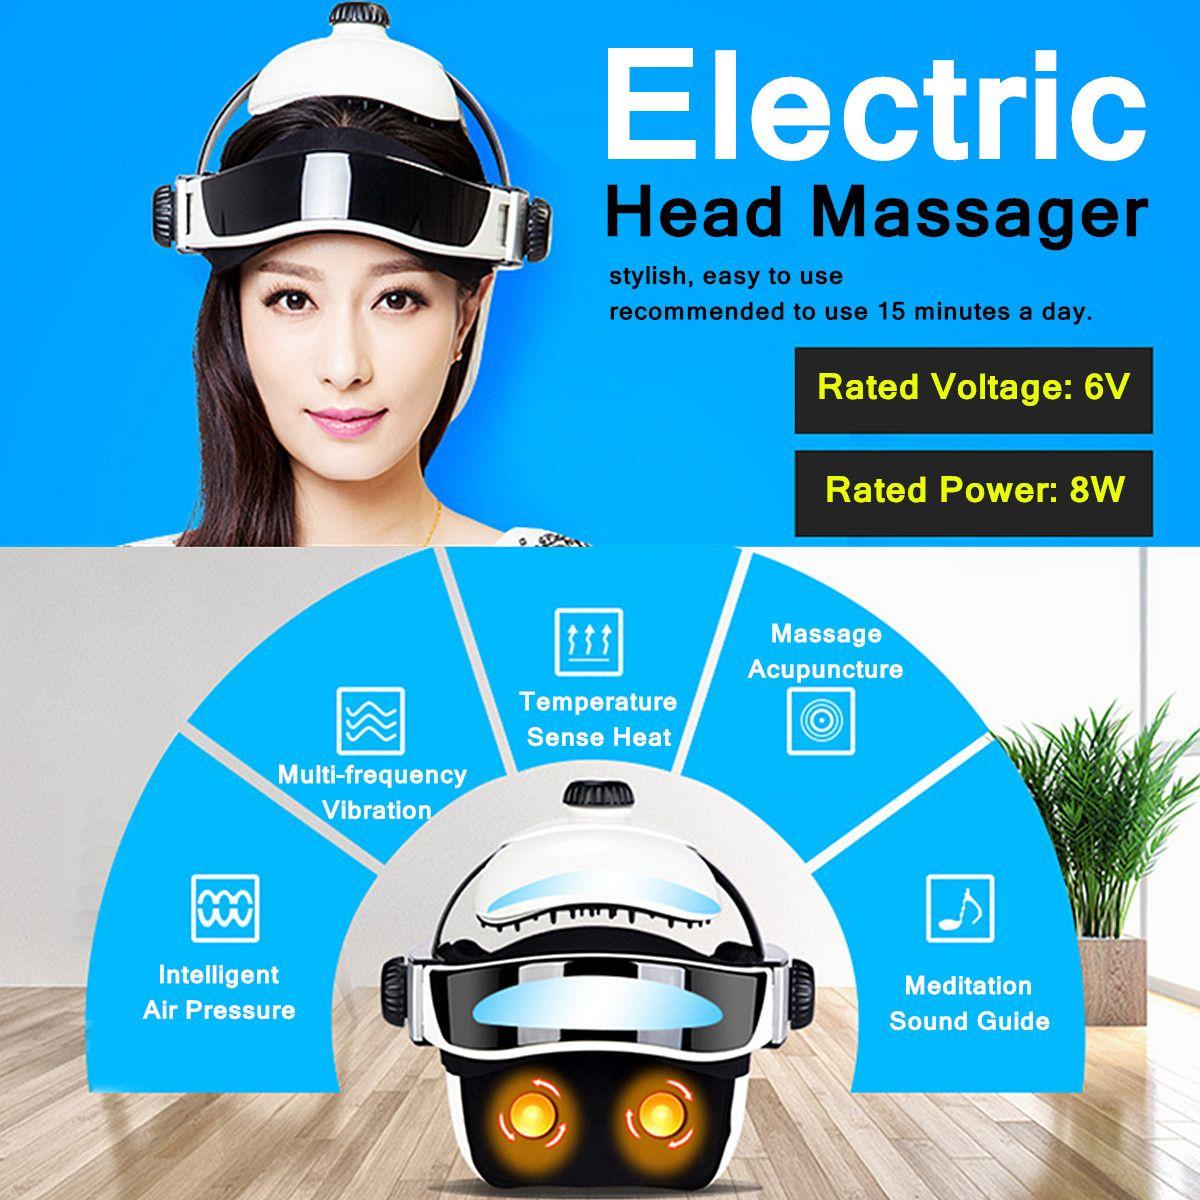 6V 8W 100-240V 50/60Hz Electric Head Massager Infrared Pressure Relax Acupuncture Music Massage Helmet ABS+ Rubber + Sponge